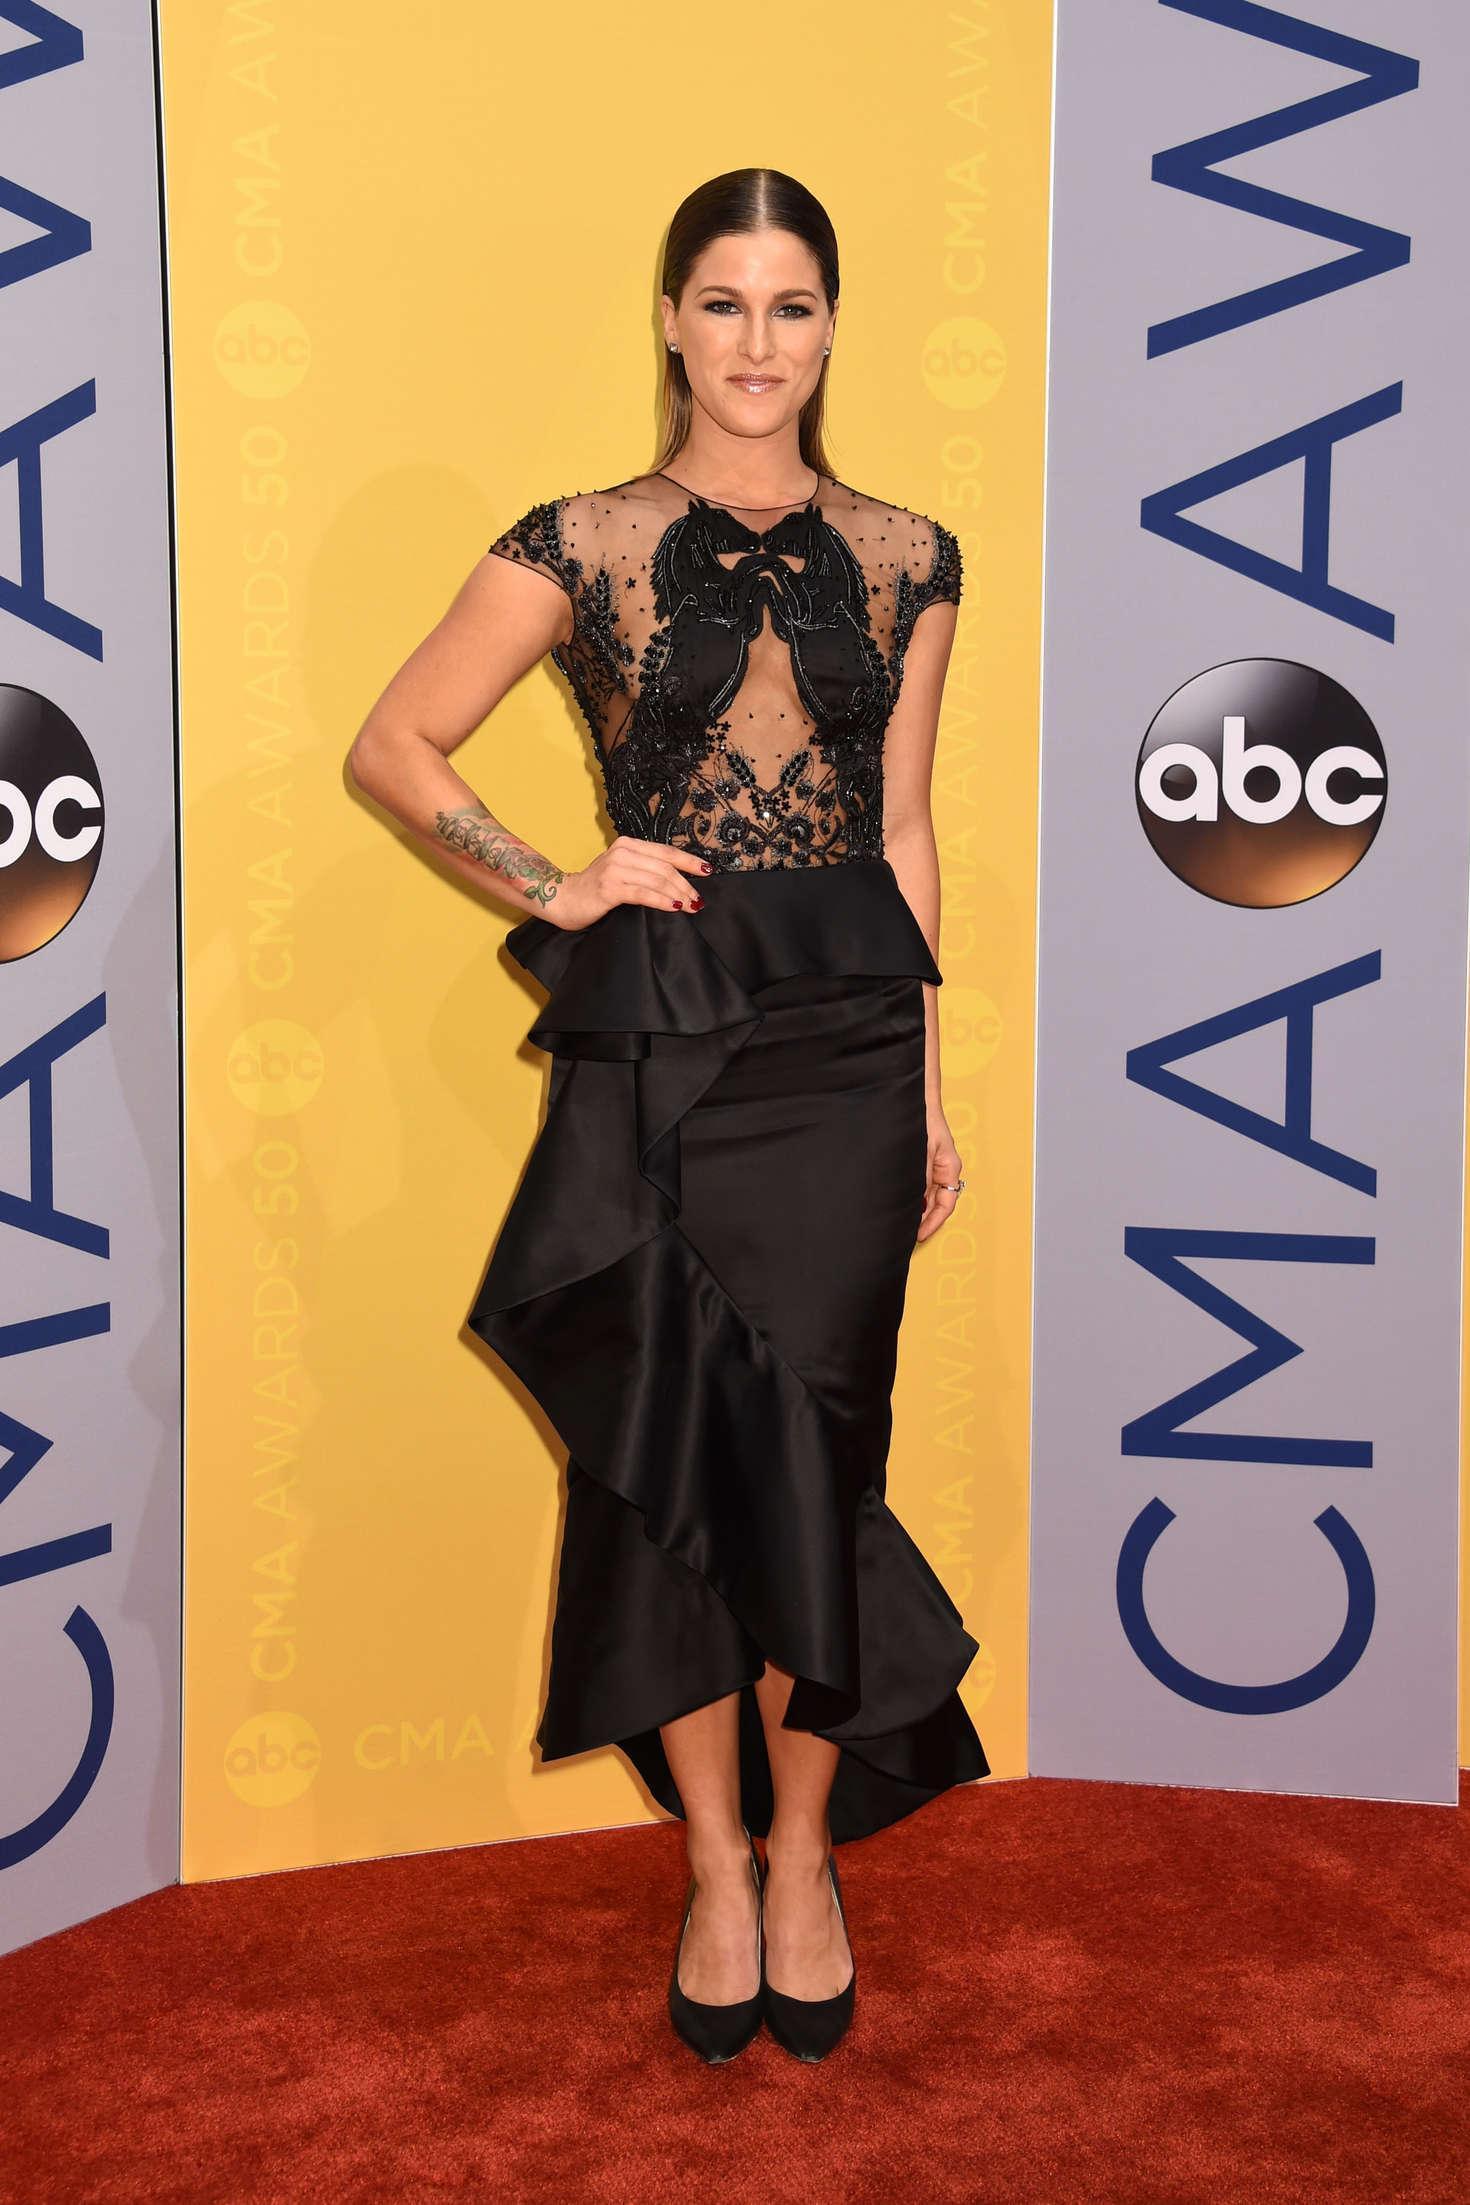 Cassadee Pope - 50th Annual CMA Awards in Nashville